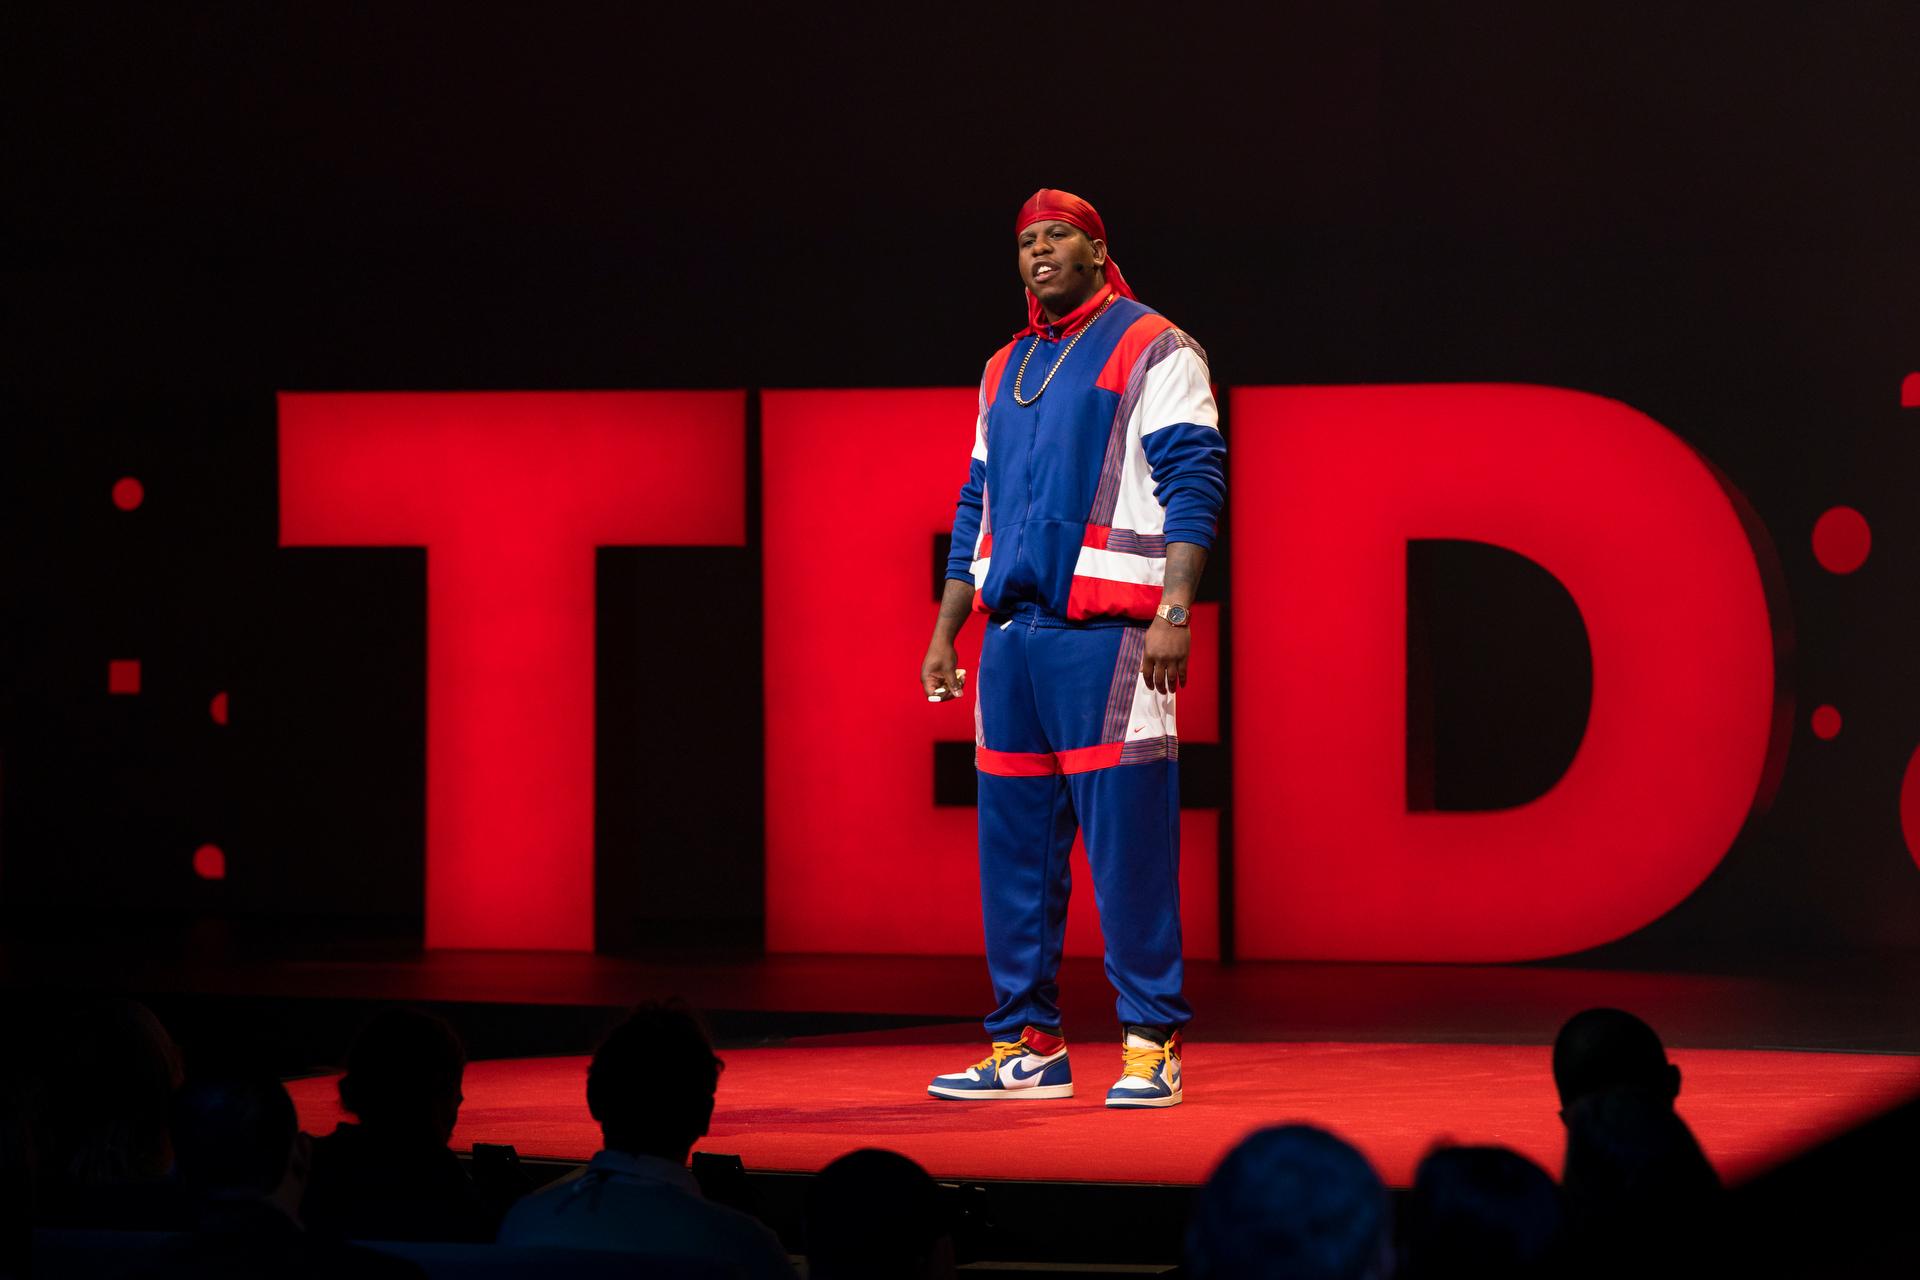 Jon Gray speaks at TED2019